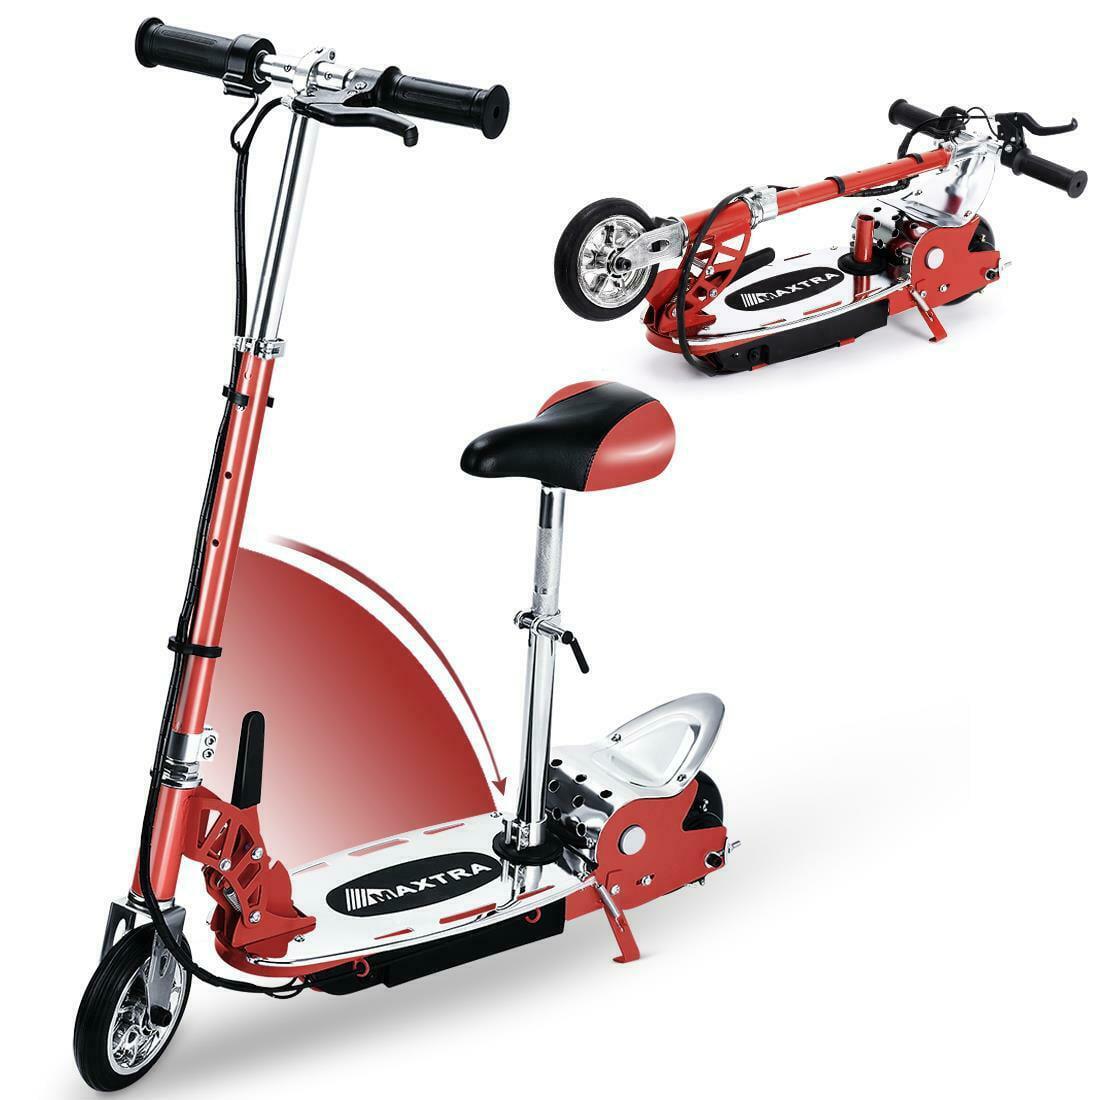 2018 MINI e bike Folding Electric Bike 48V12A Lithium